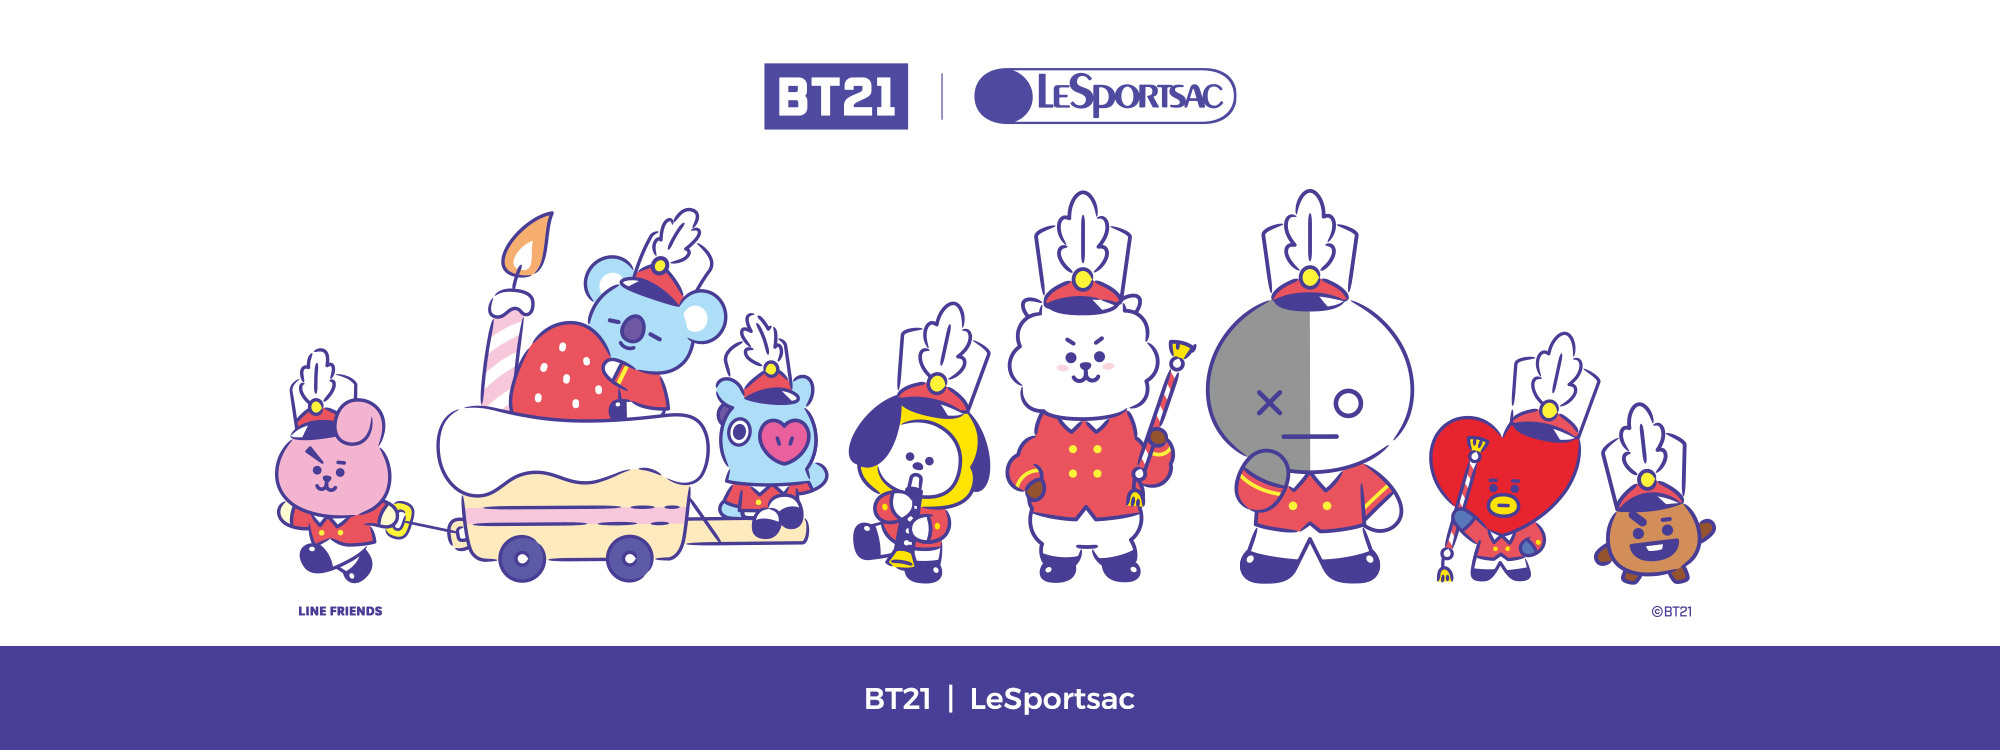 BT21 x lesportsac, line friends